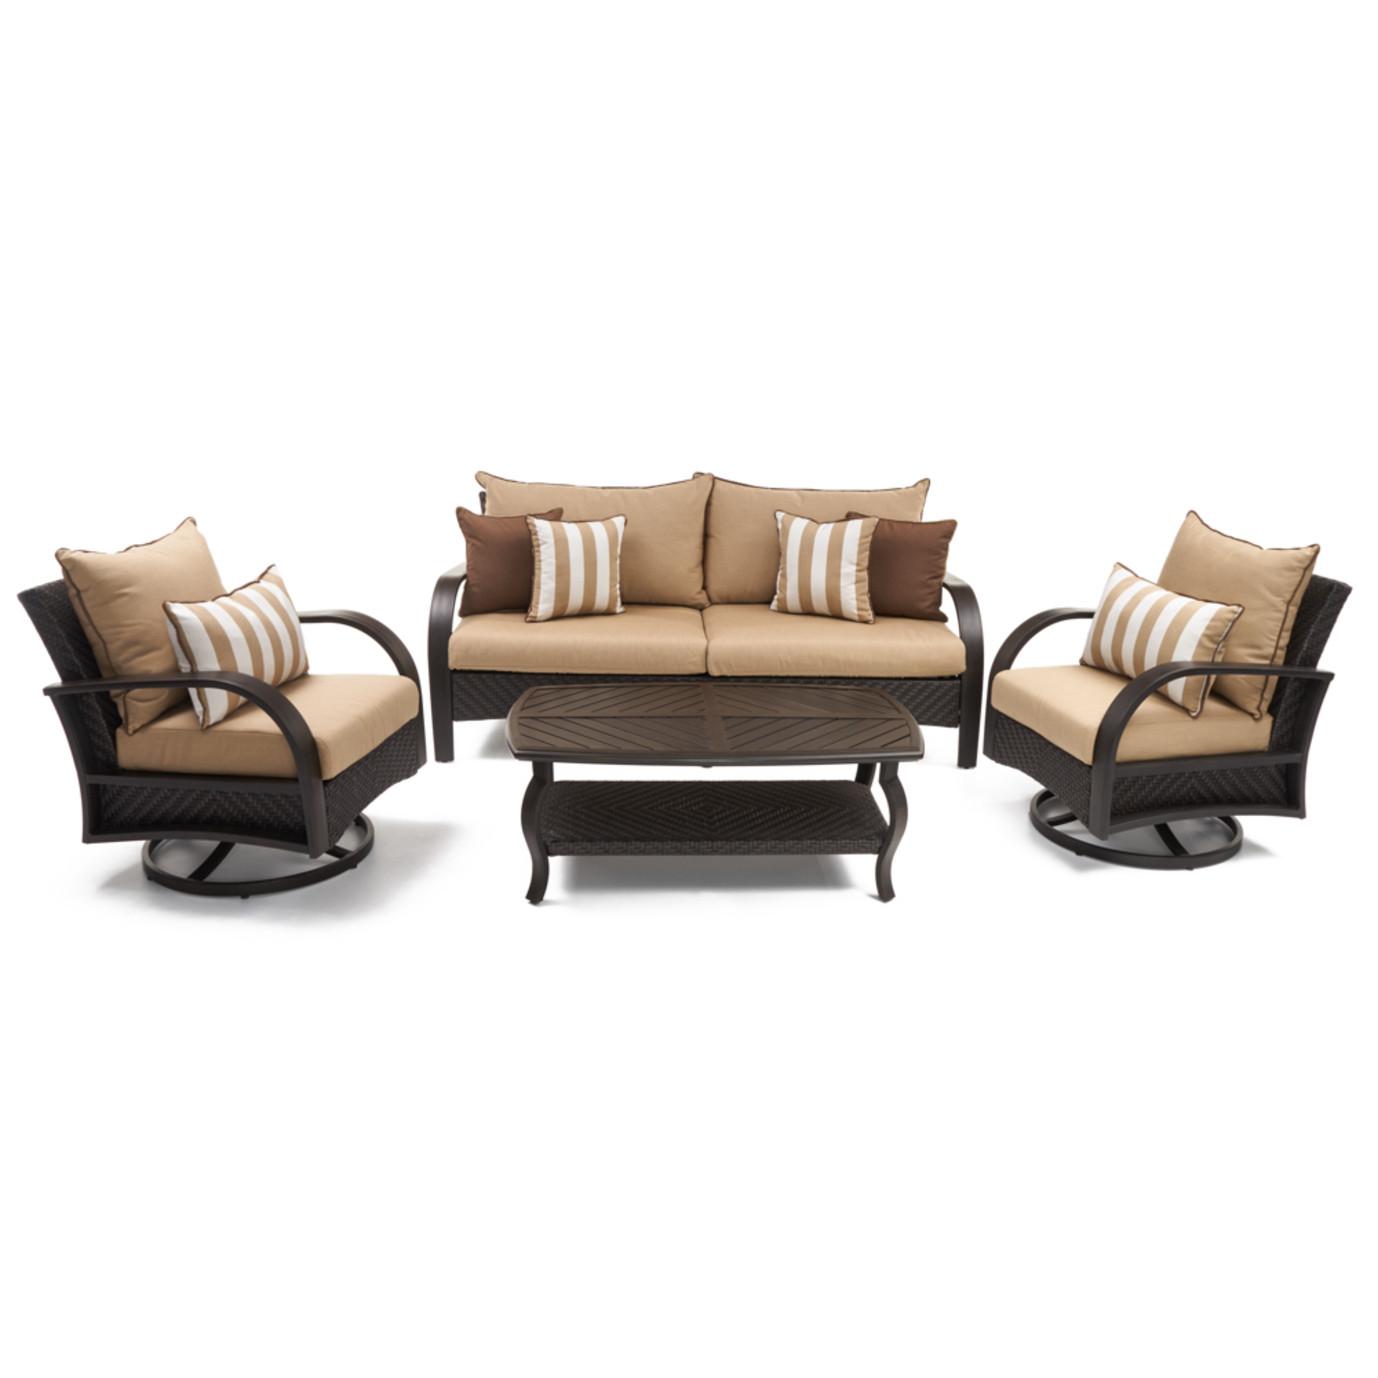 Barcelo™ 4pc Motion Club & Sofa Set - Maxim Beige